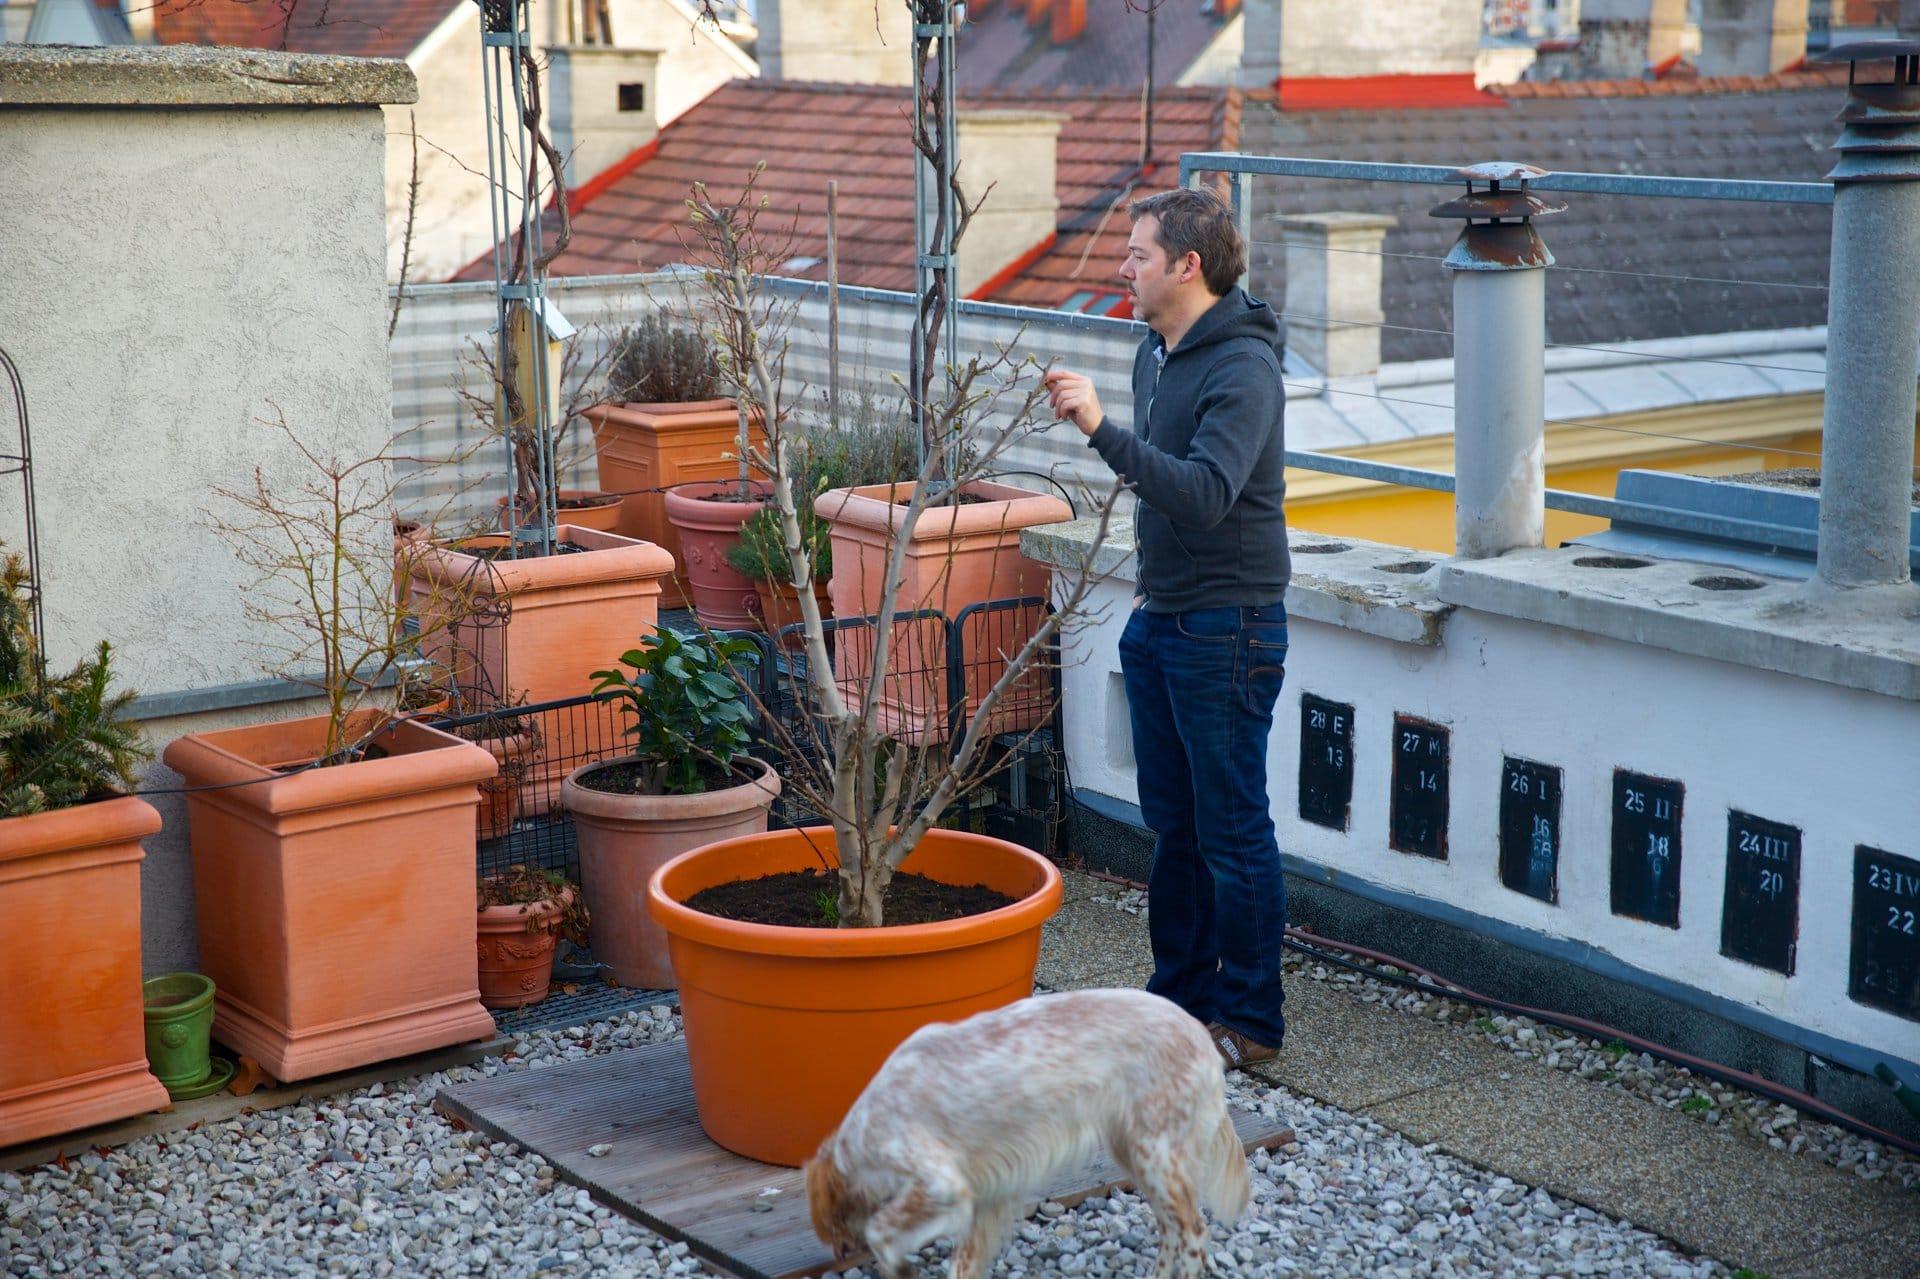 2014 terrasse entwintert 6